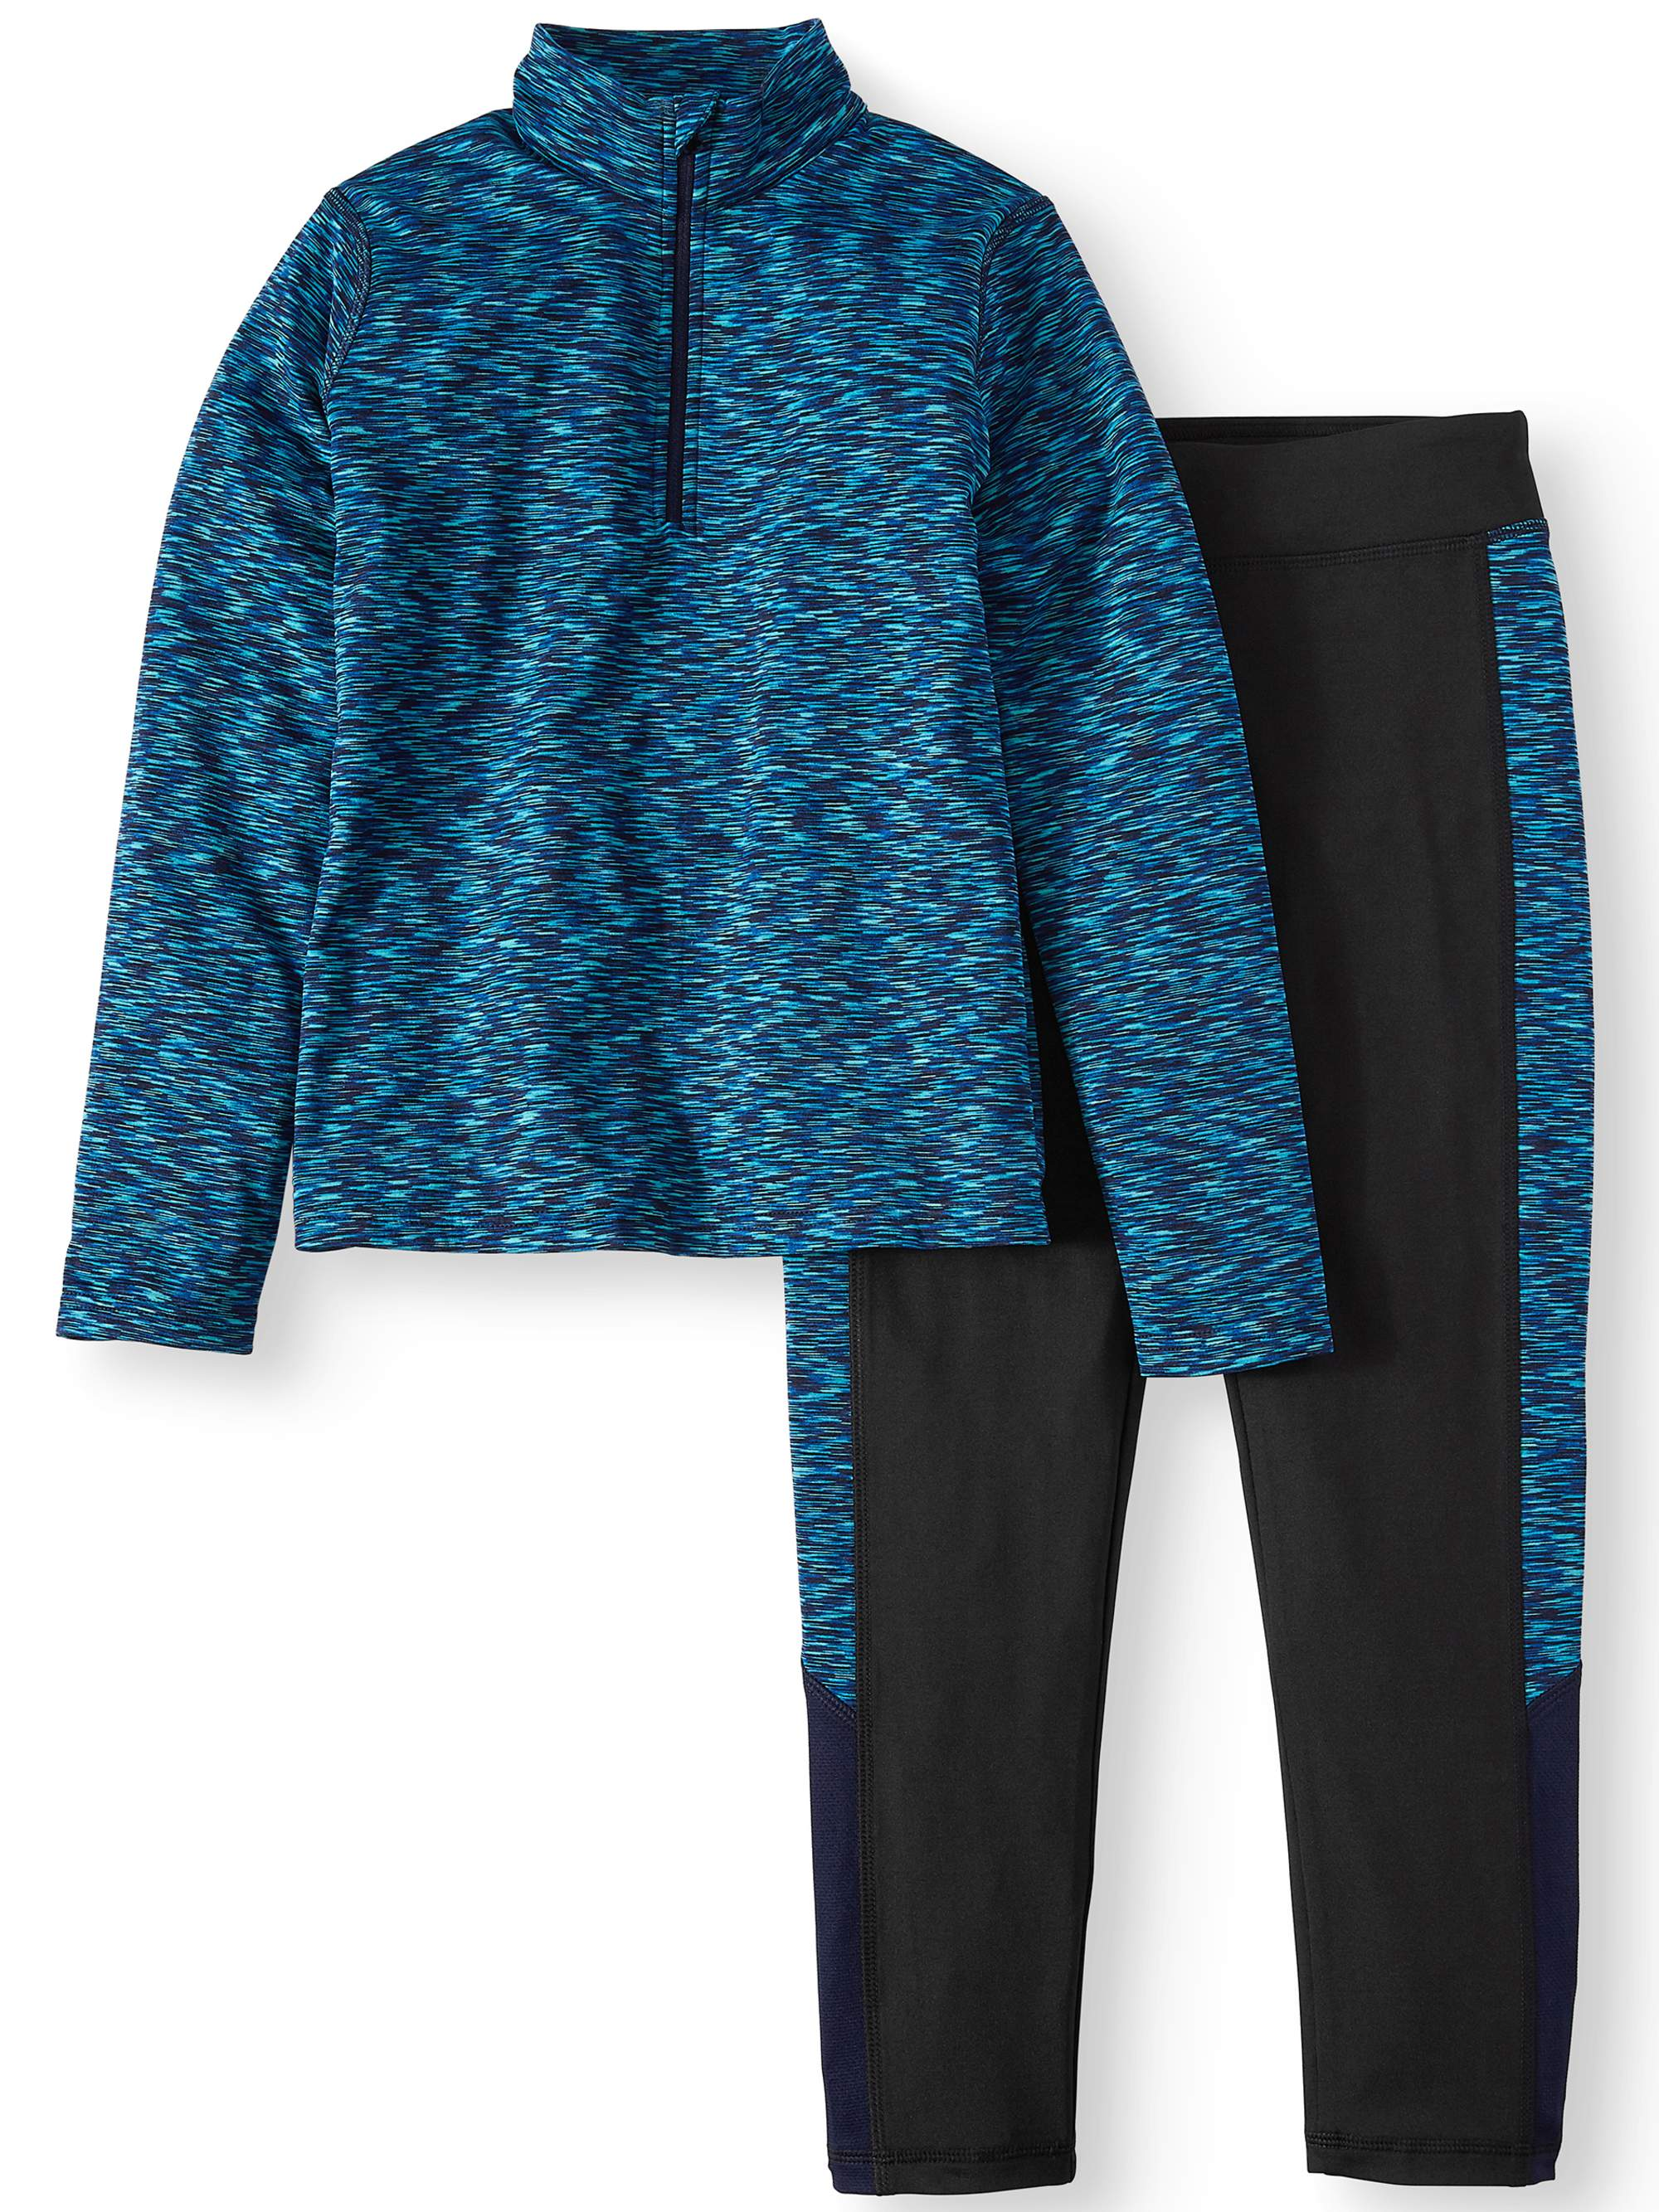 Rainbeau Moves Space Dye 1/4 Zip Pullover and Legging, 2-Piece Active Set (Little Girls & Big Girls)